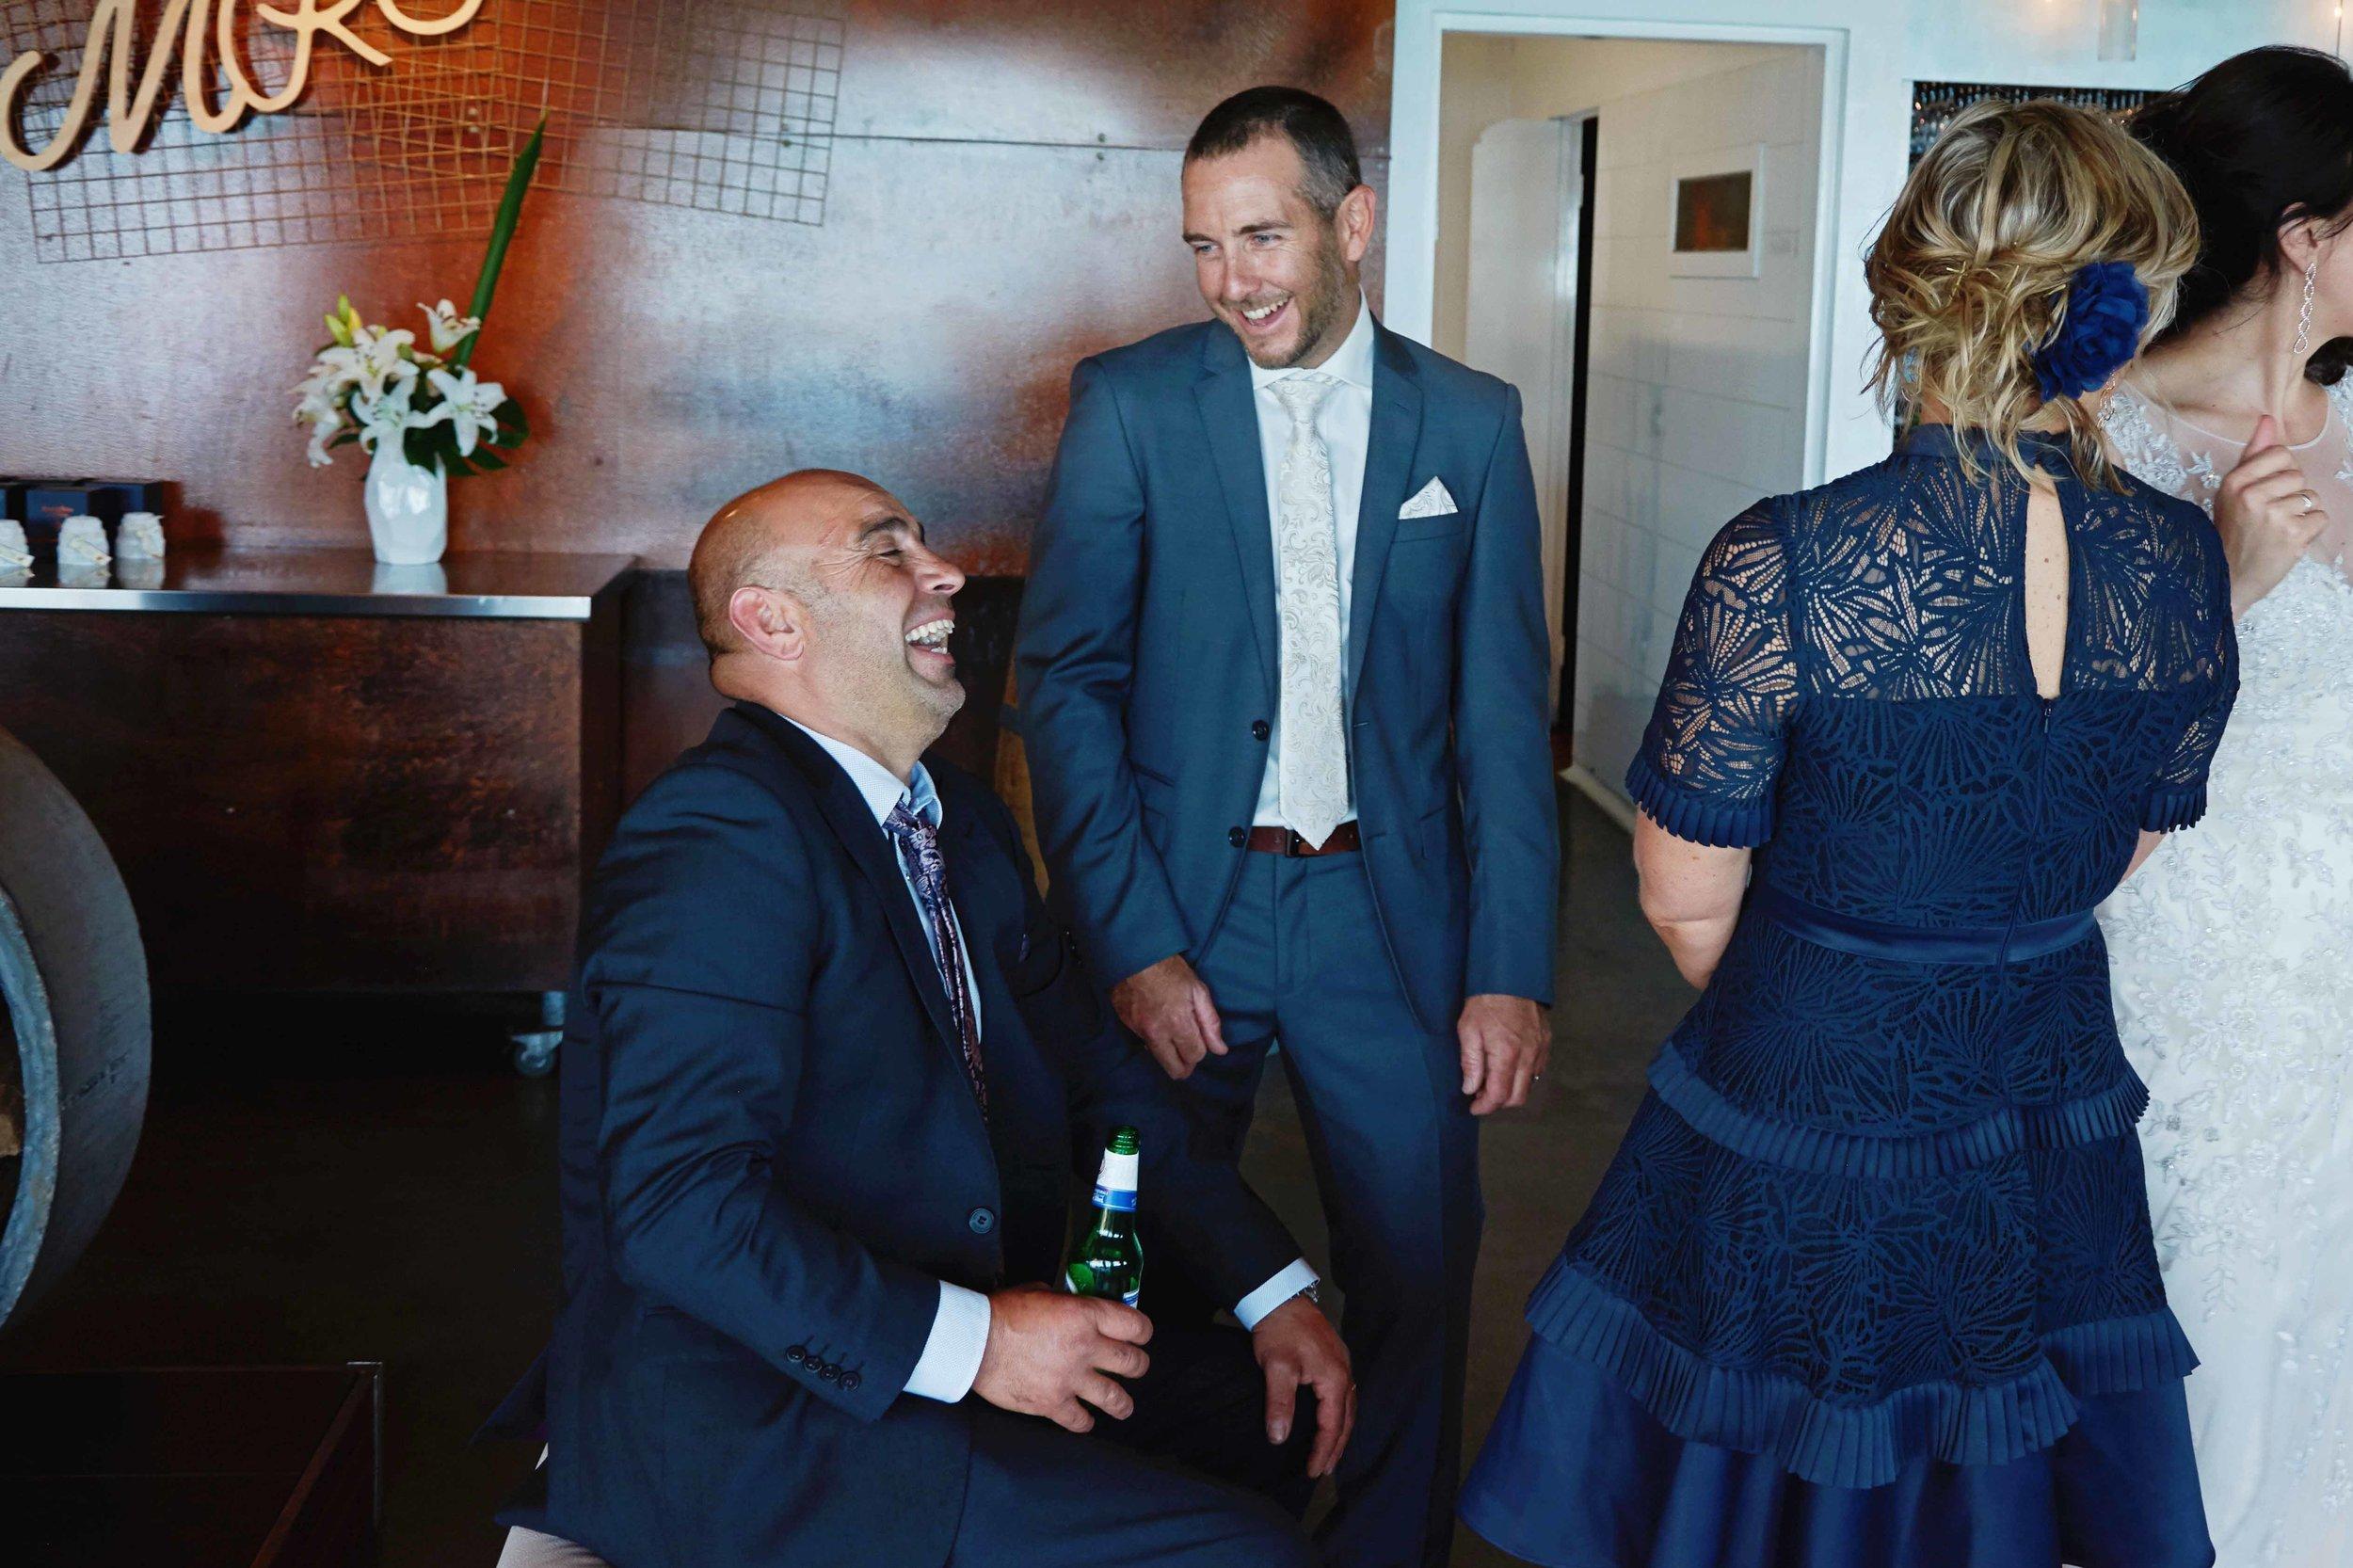 sorrento-wedding-photography-all-smiles-marissa-jade-photography-85.jpg